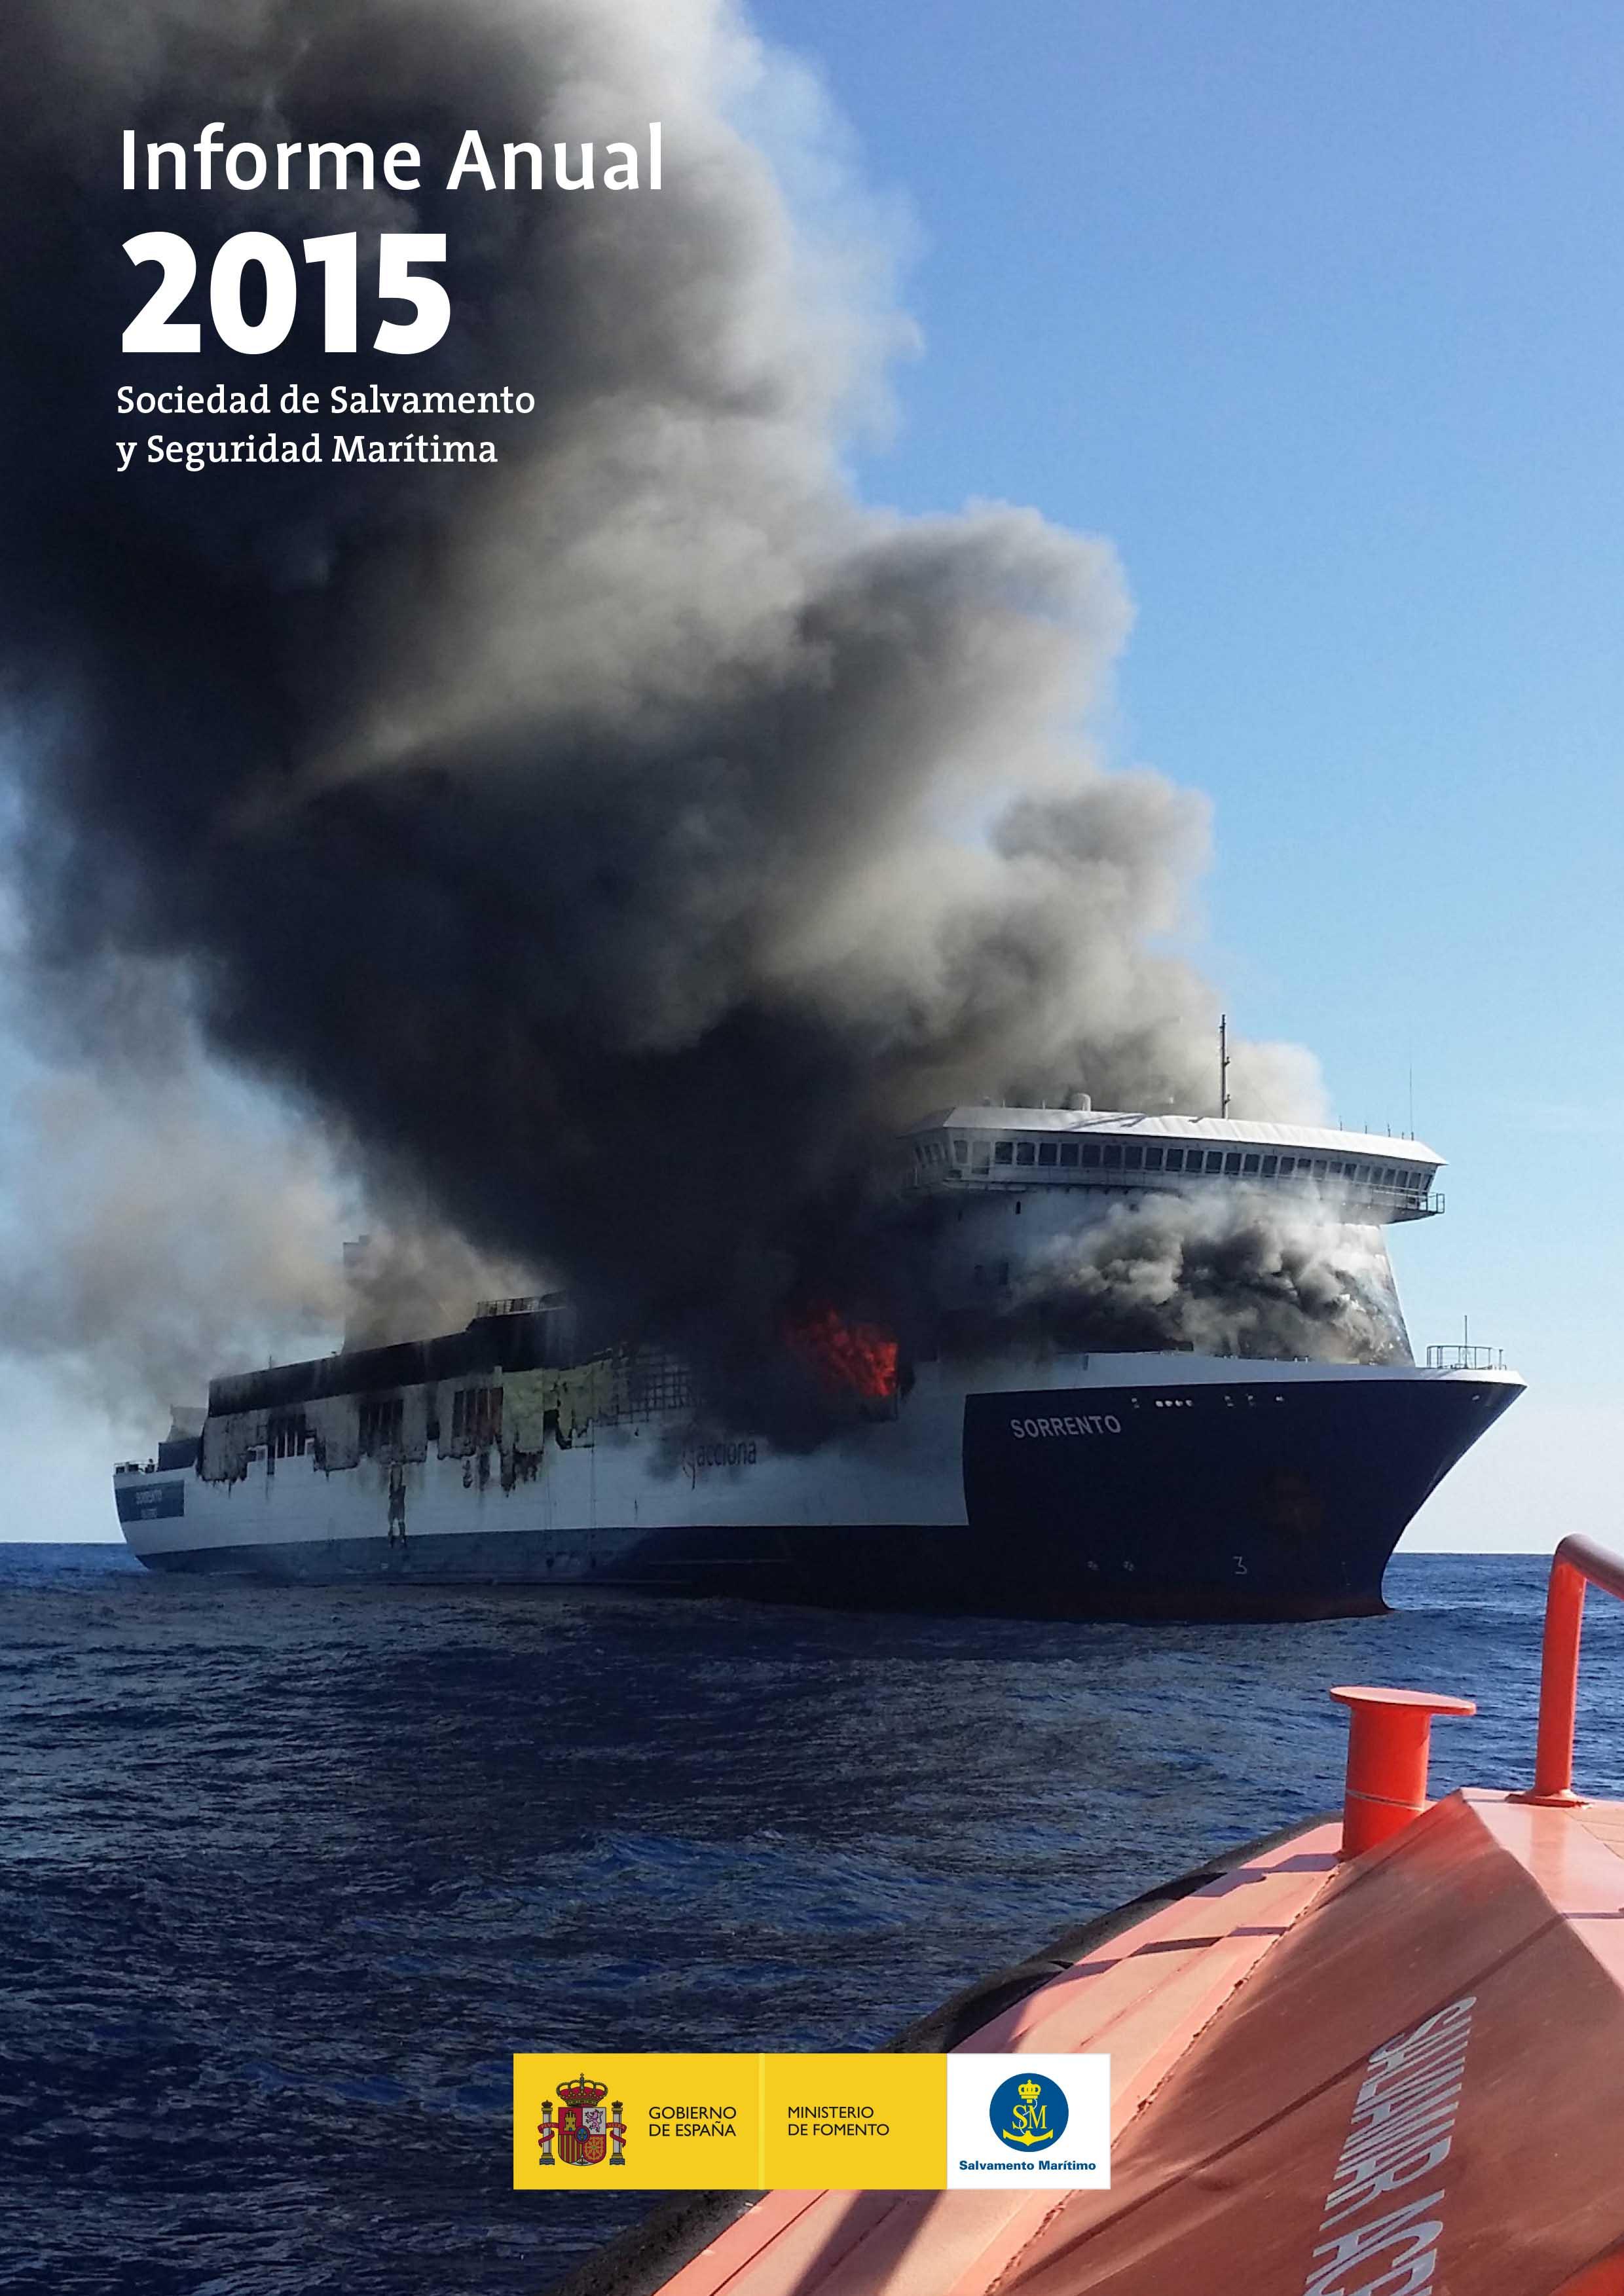 Salvamento Marítimo Informe Anual 2015